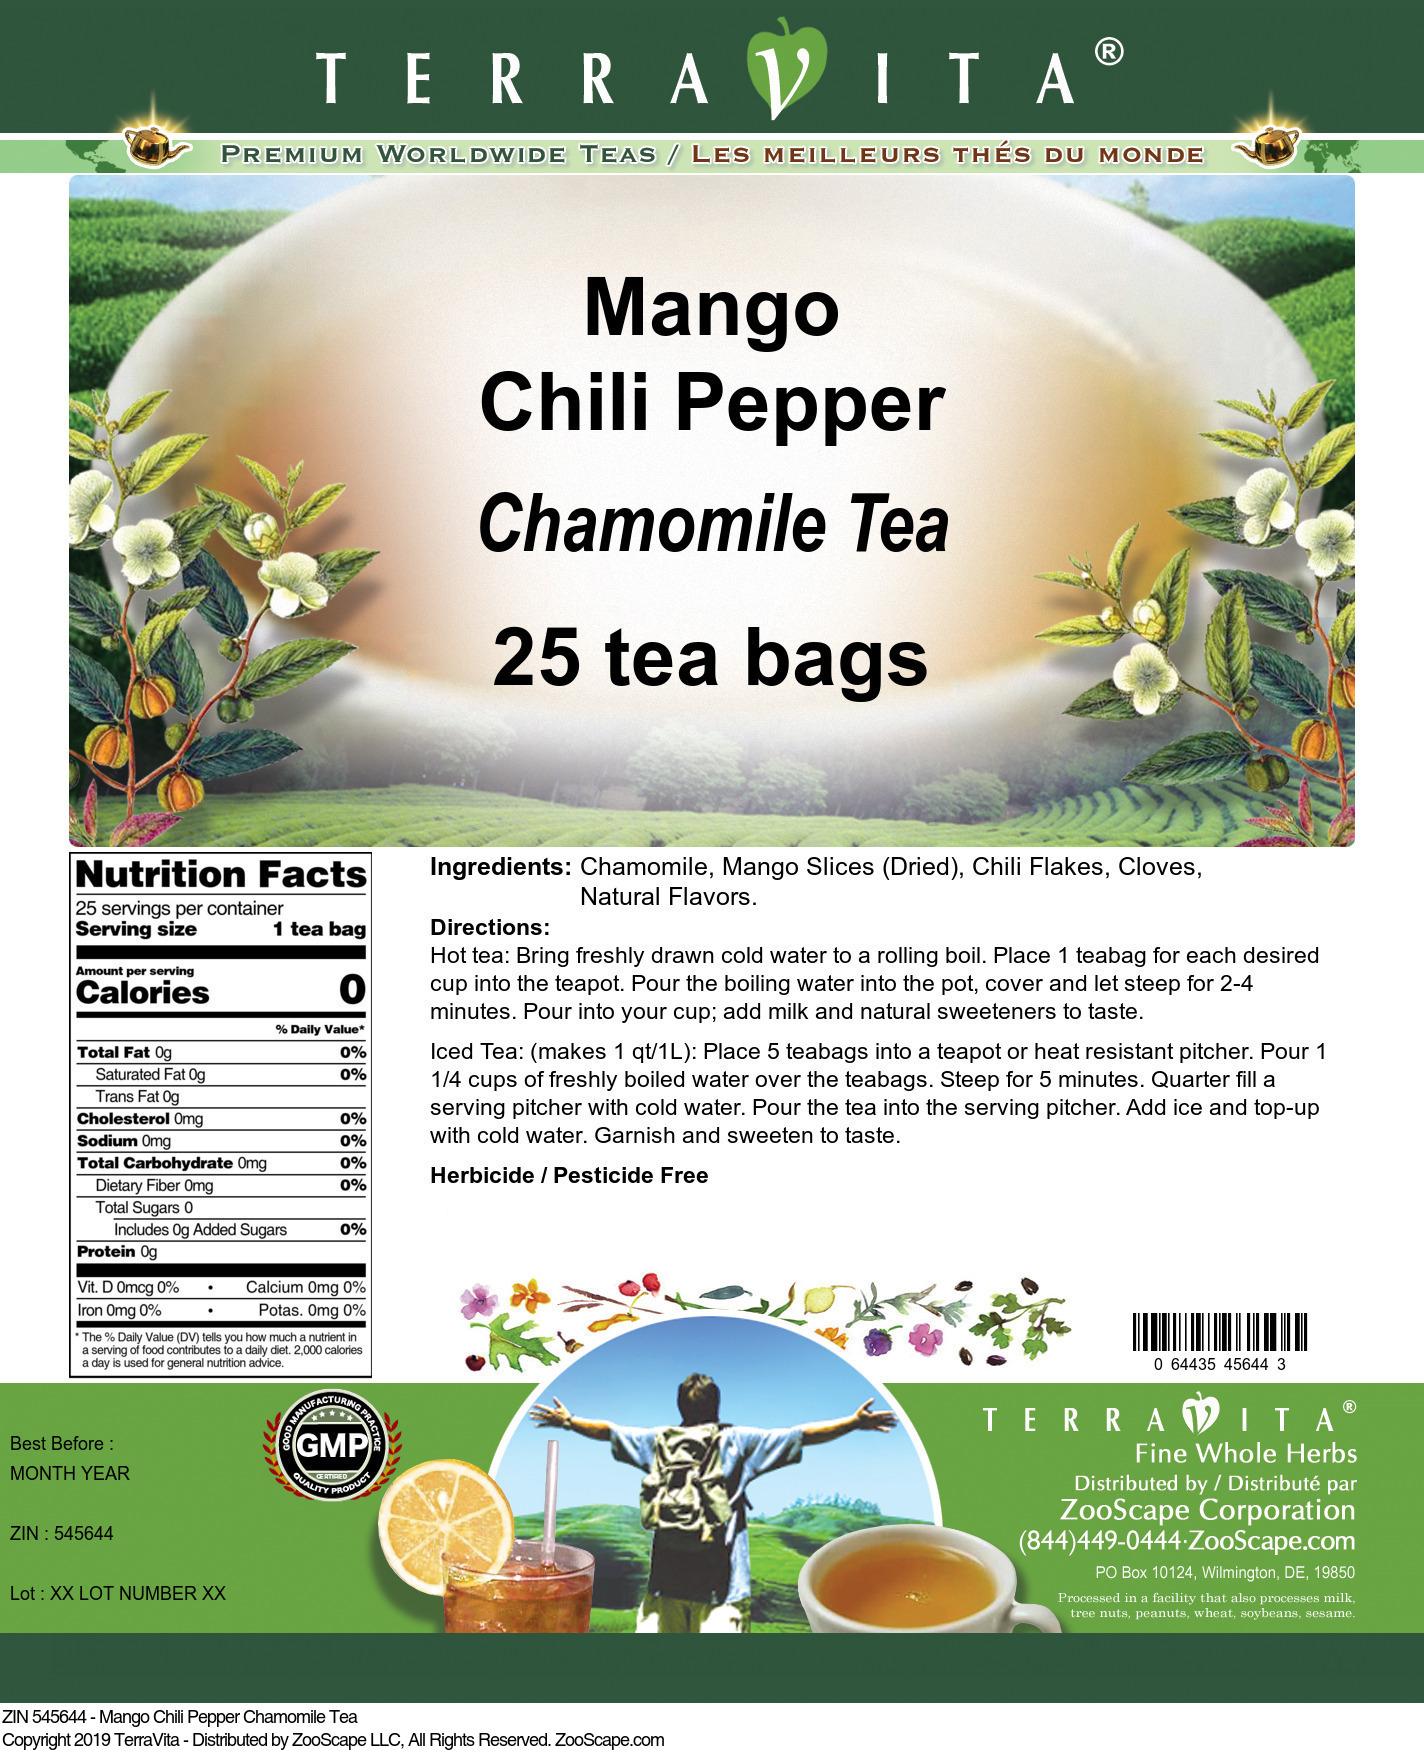 Mango Chili Pepper Chamomile Tea